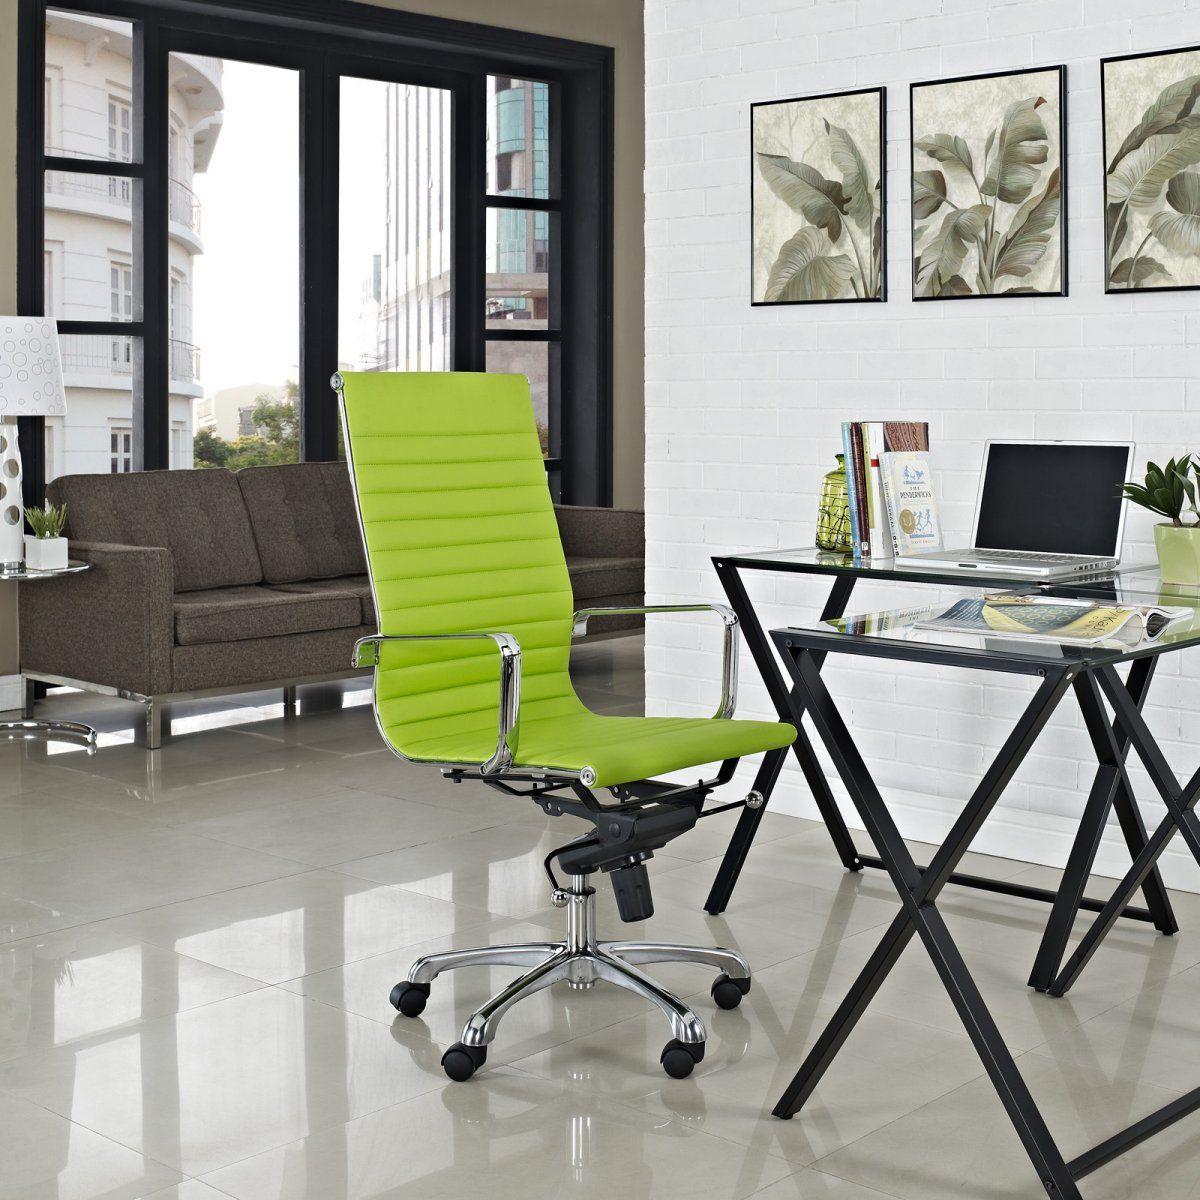 Modern Minimalist Desk modern minimalist office design with stylish green swivel chair